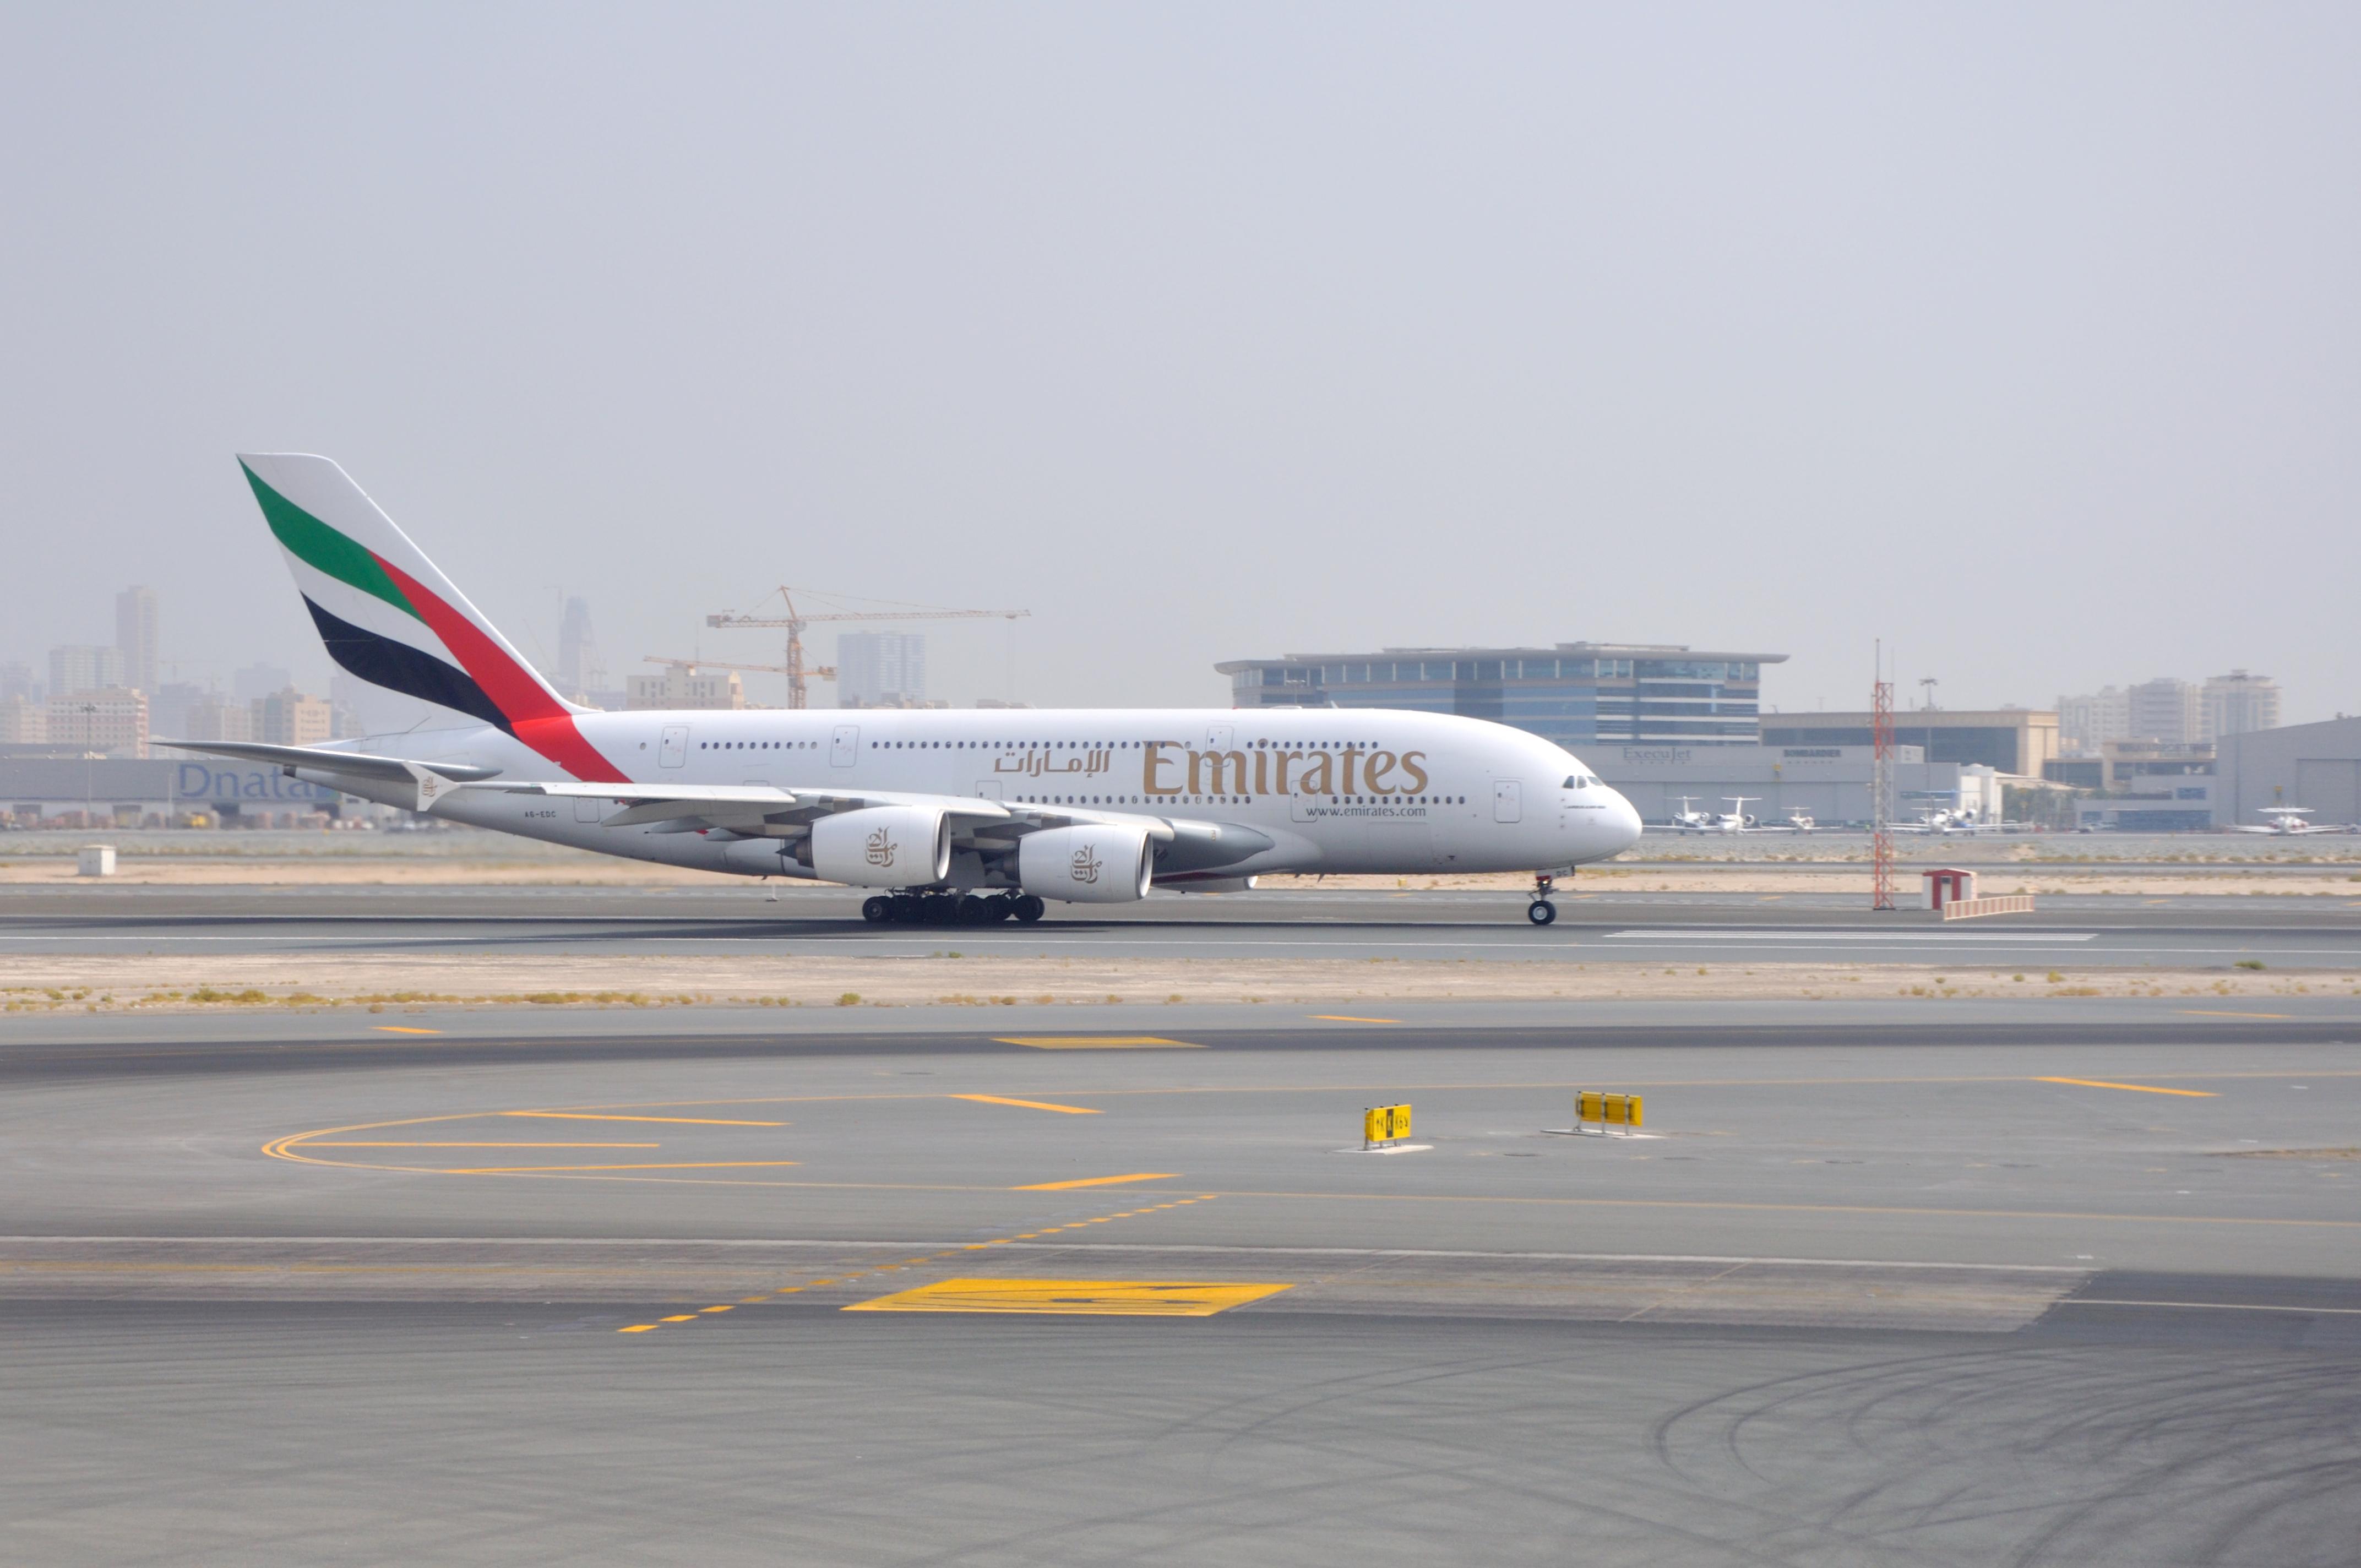 Dubai_Airport_16.08.2009_05-14-19.jpg